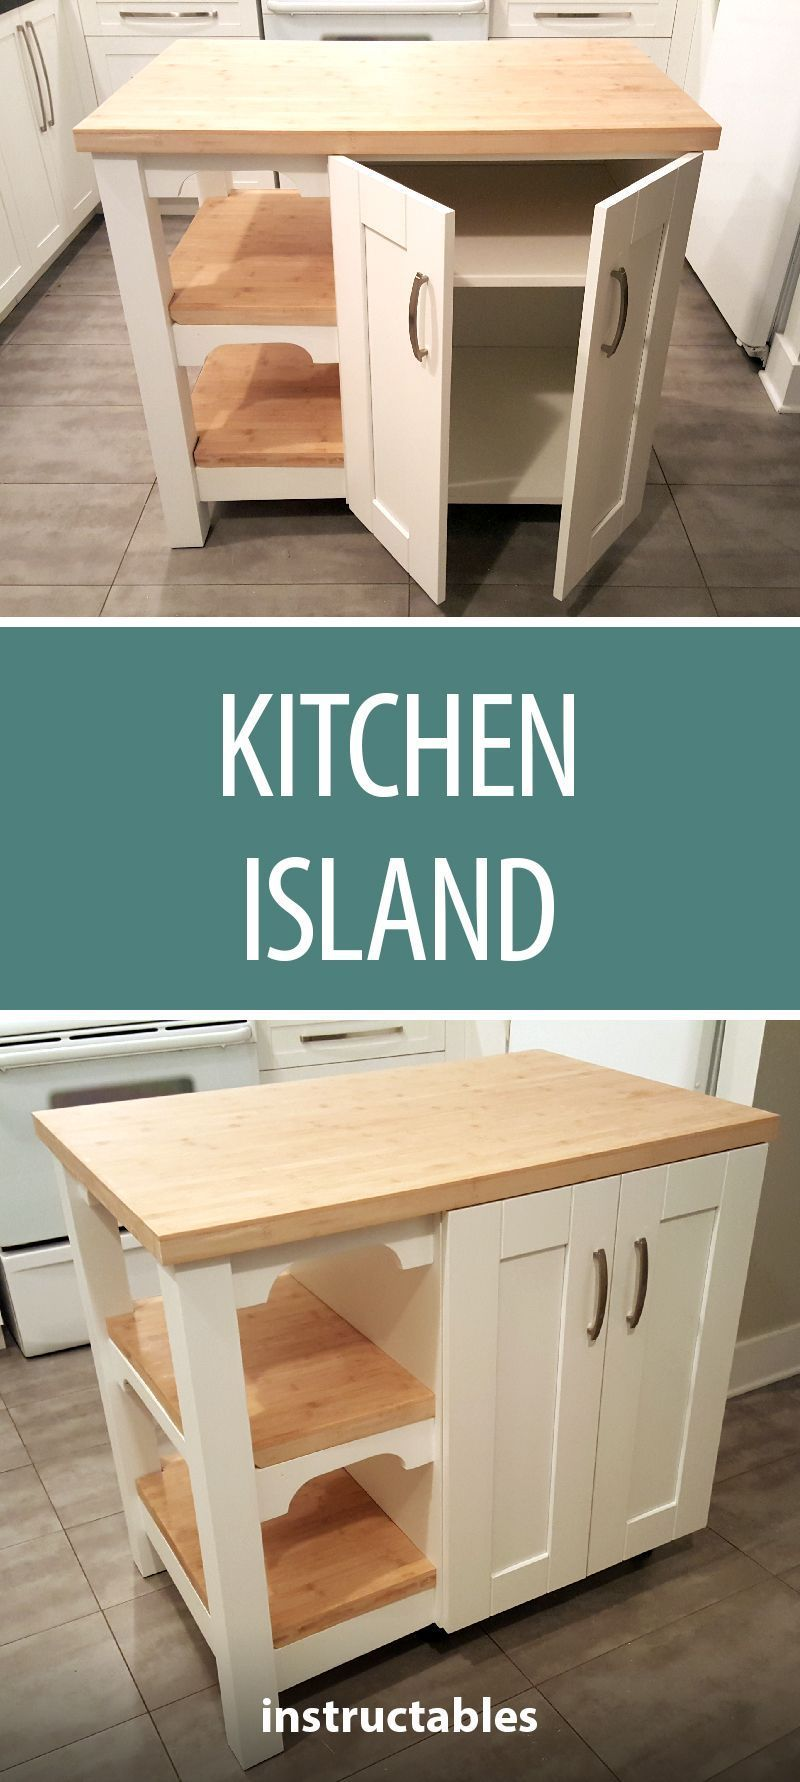 Transform A Cheap Pre Made Kitchen Cabinet Into A Personalized Kitchen Island I T In 2020 Prefab Kitchen Cabinets Kitchen Remodel Cost Custom Kitchen Island